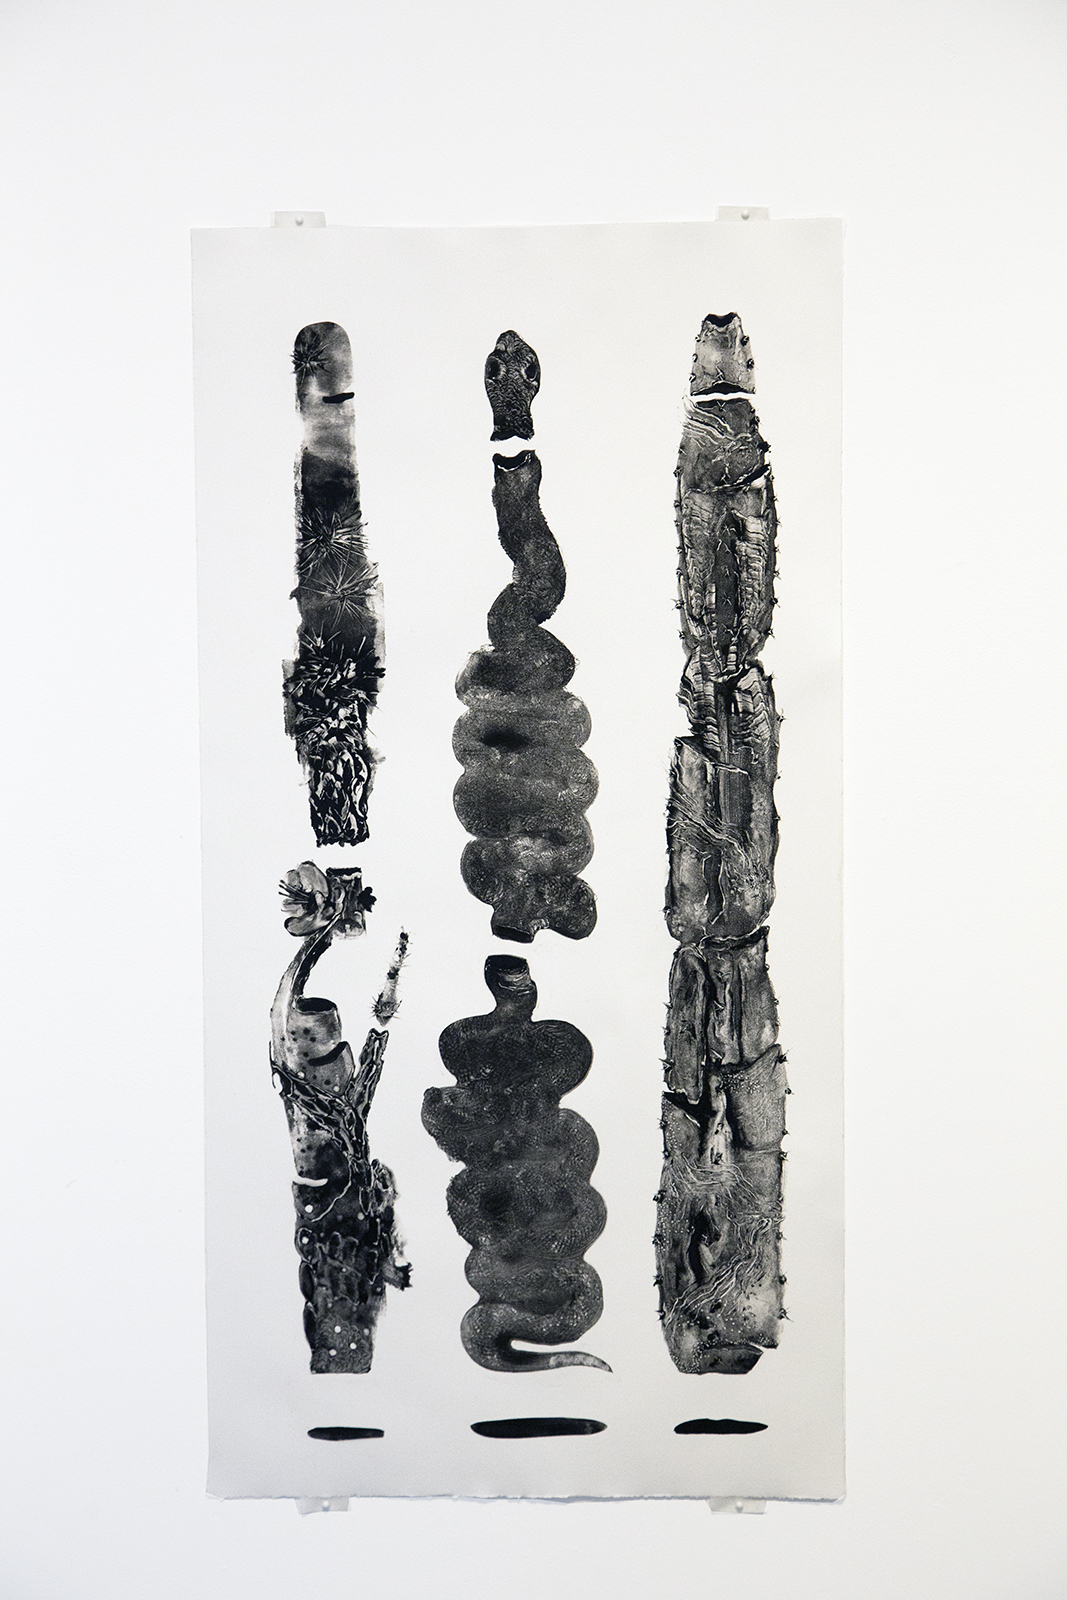 Grady Gordon at Public Land Gallery